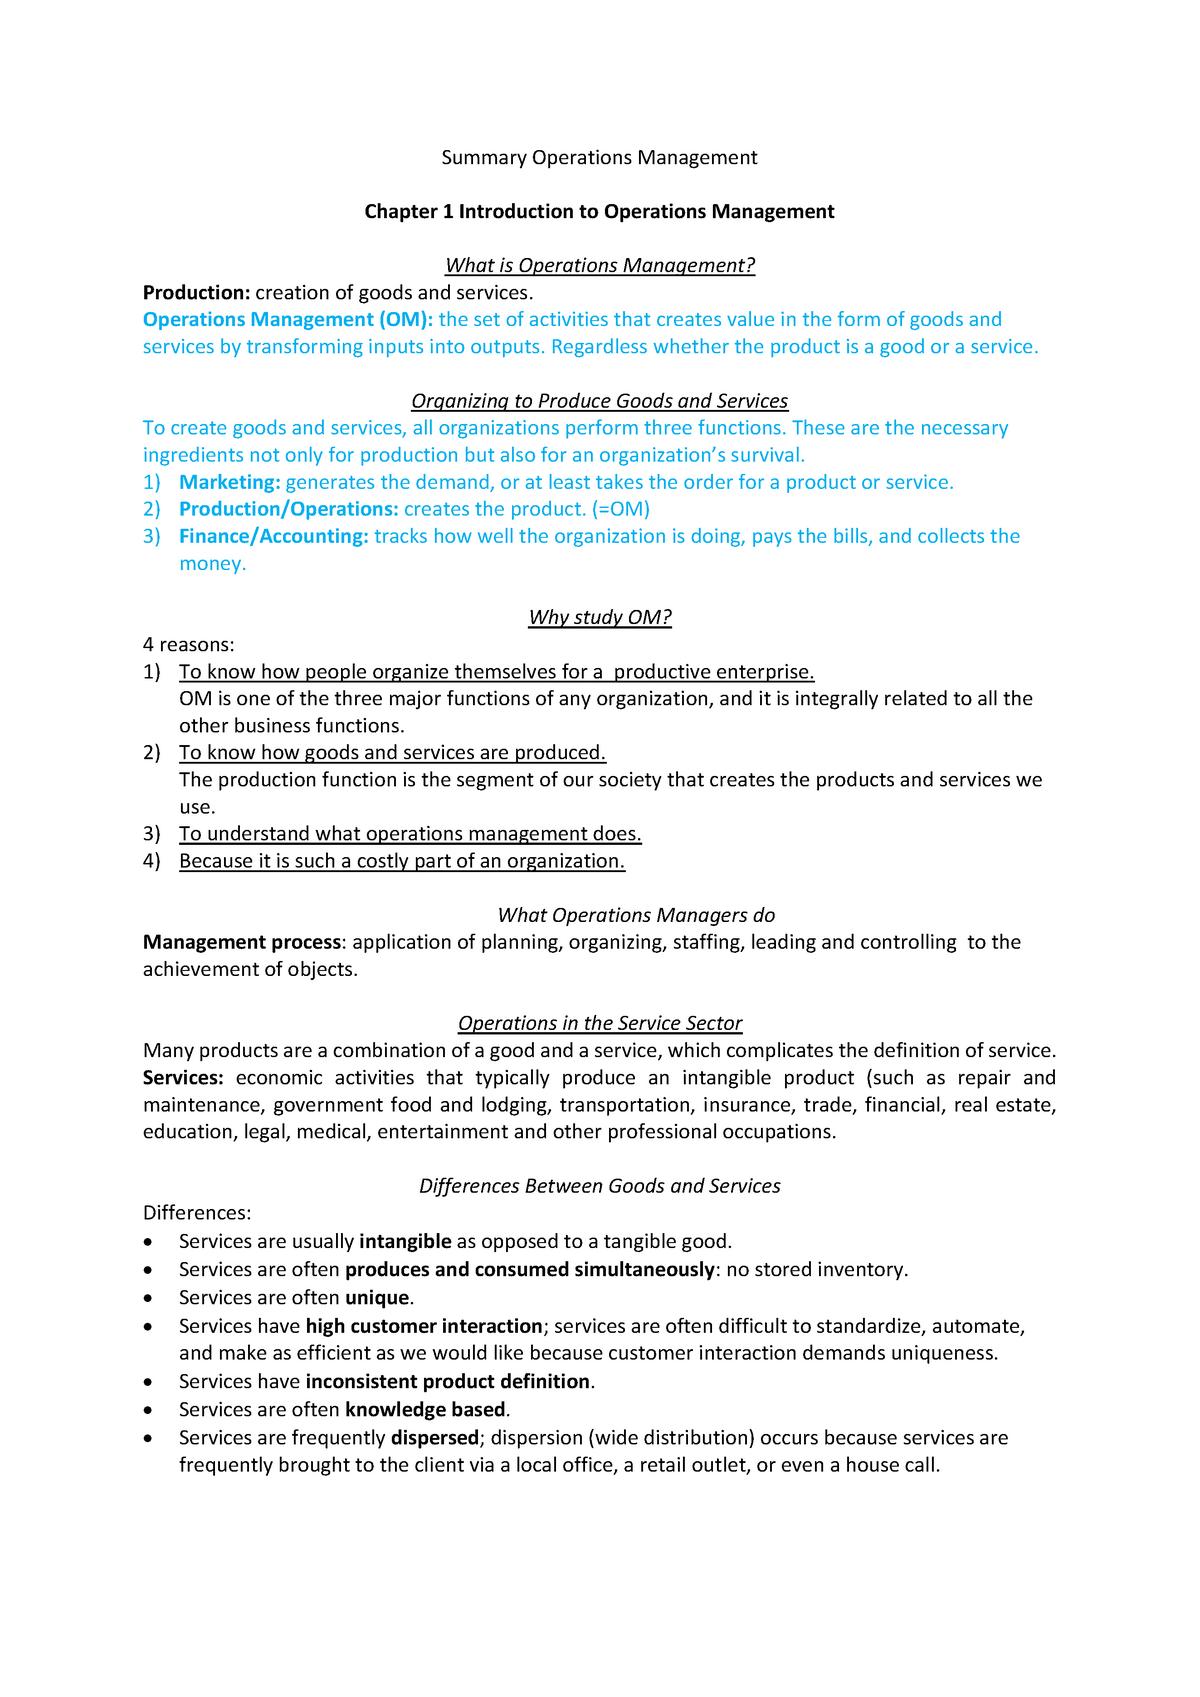 Summaries Operations Management Resit - BAP057 - StudeerSnel nl